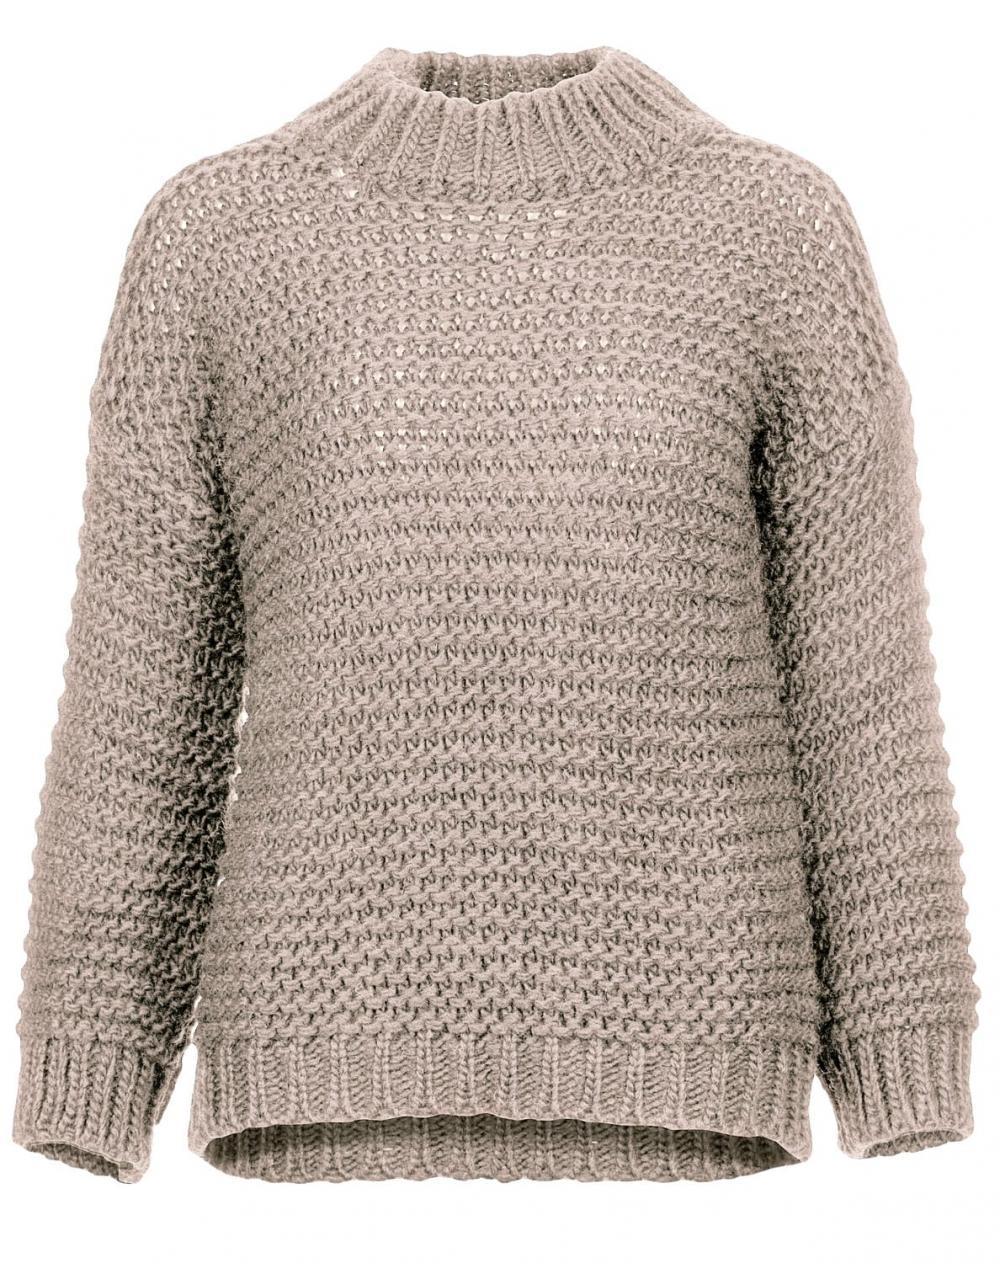 Pullover Bine